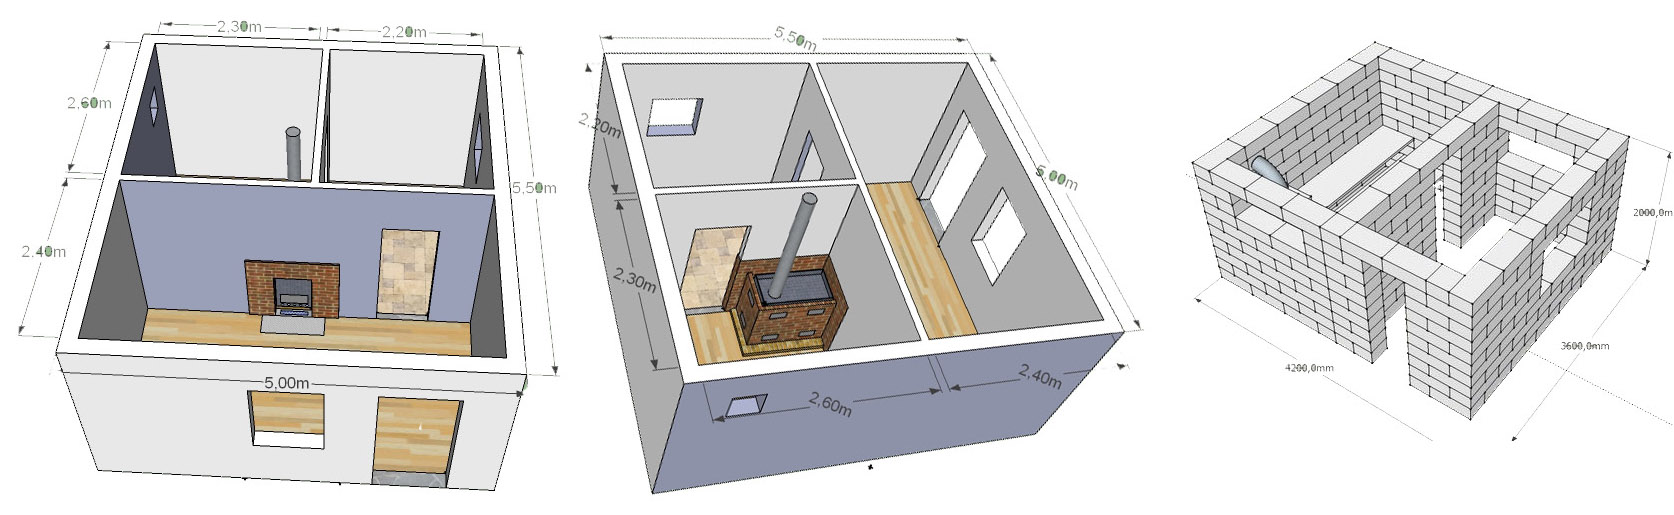 Типовой план проект бани из газобетона под ключ